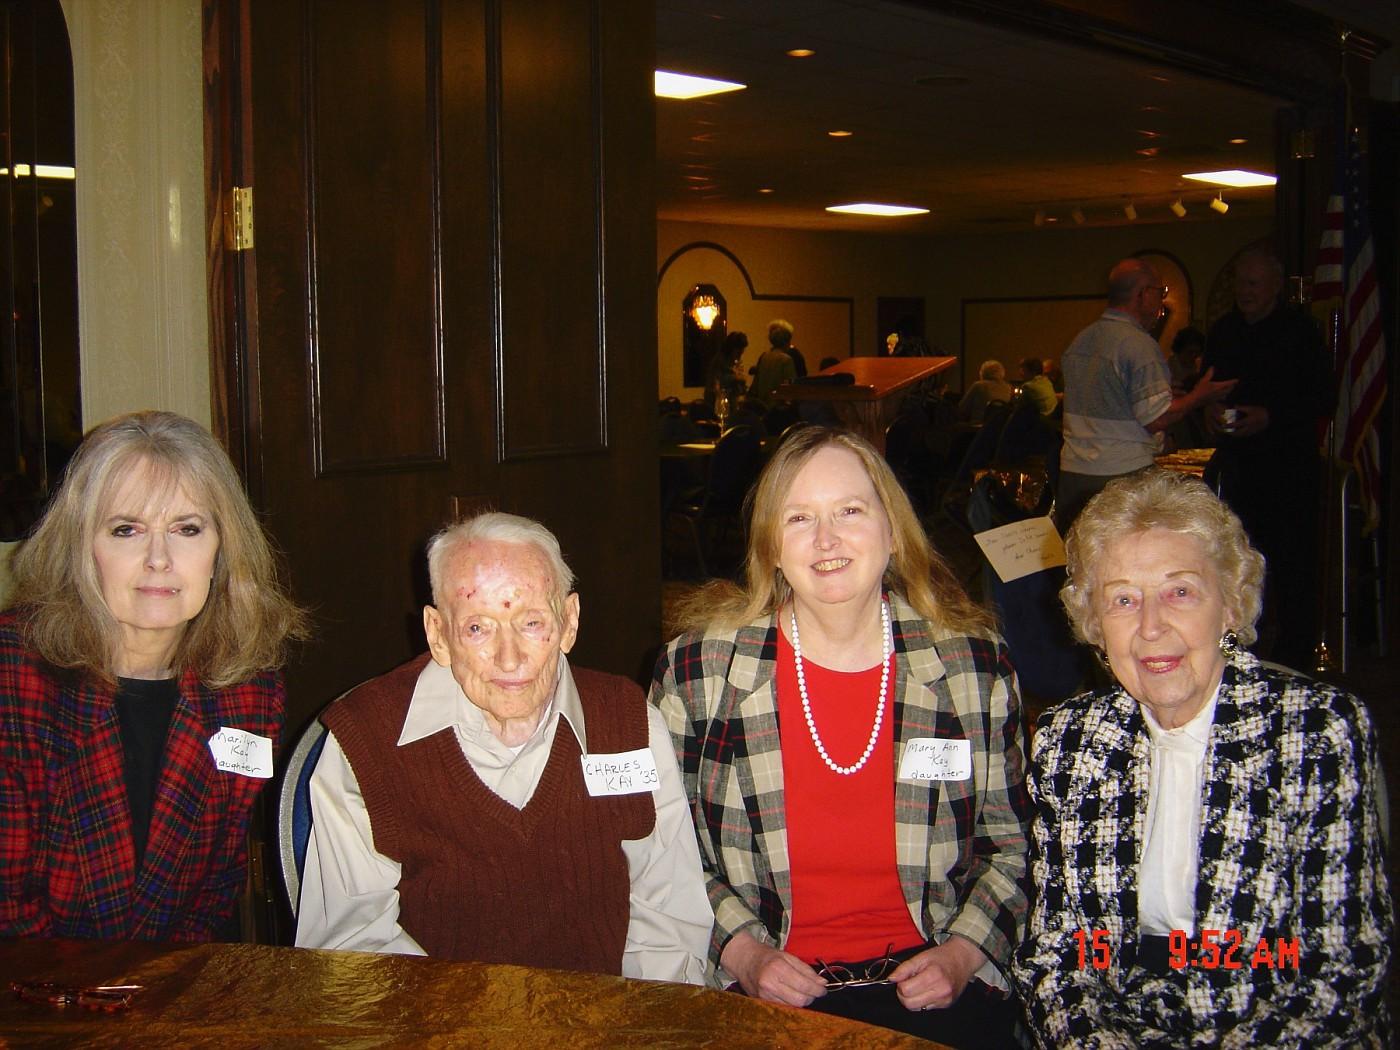 Marilyn & father, John Kay, Mary Bouas & Elvira Rebienne